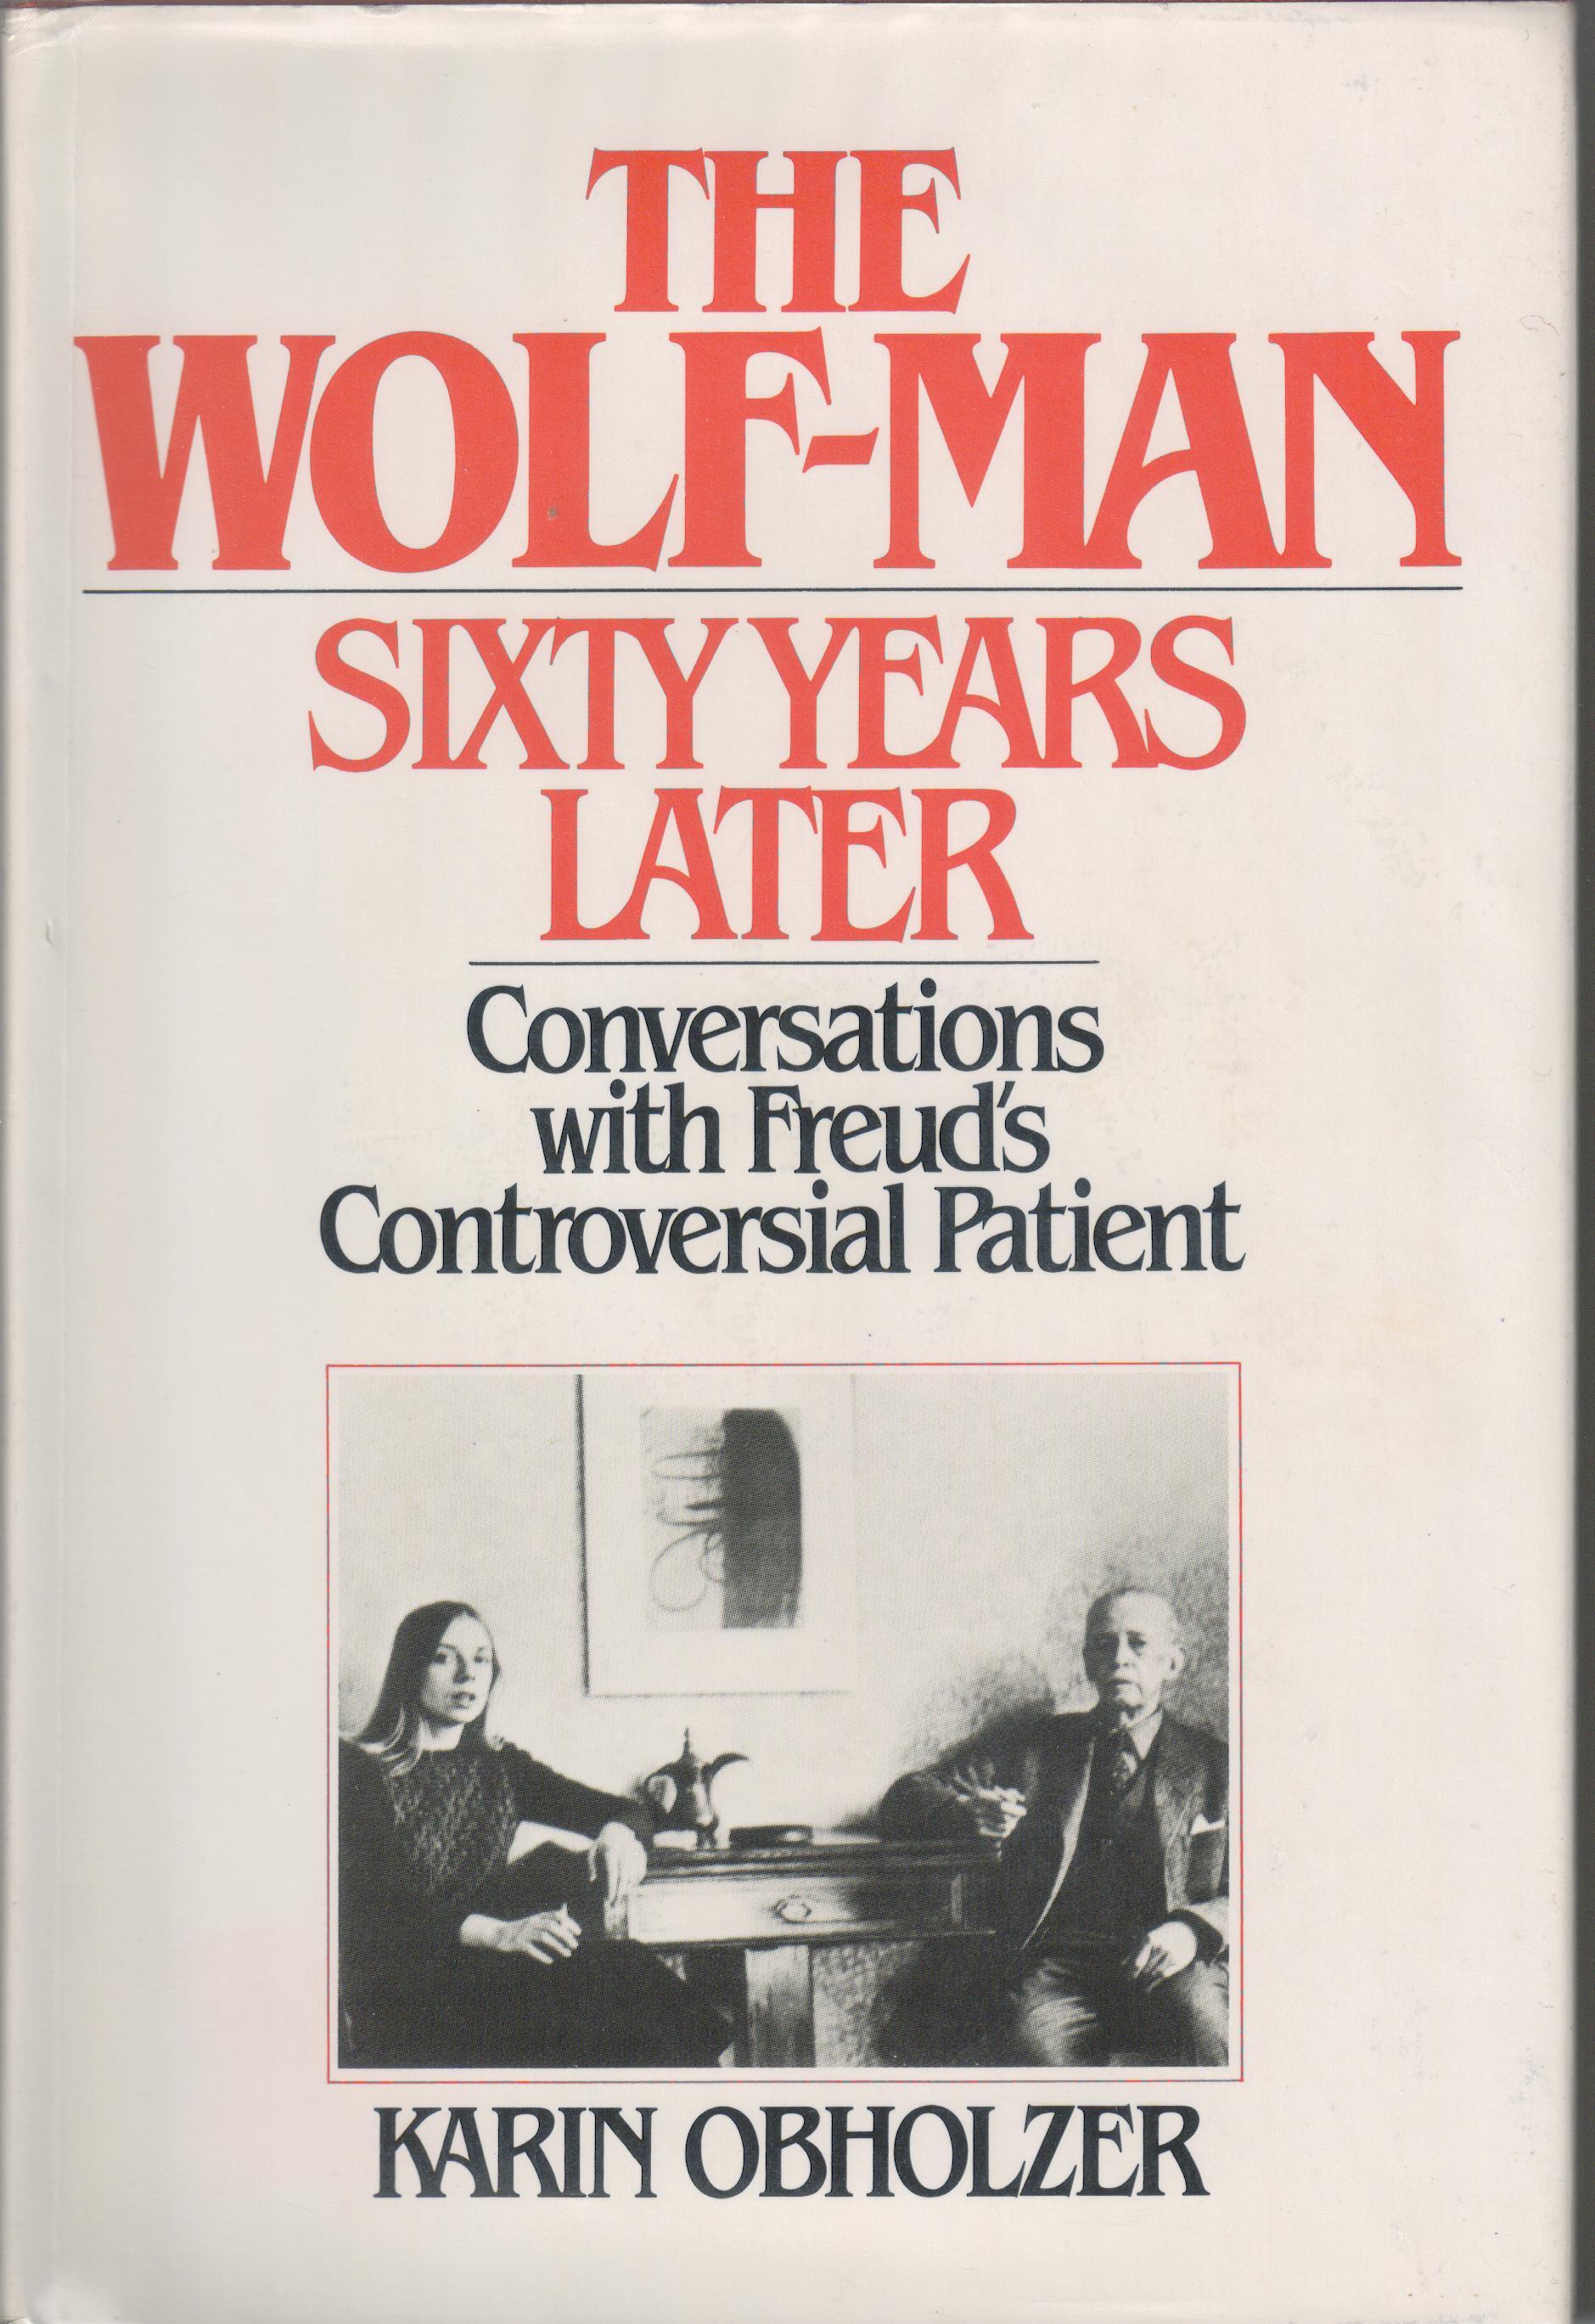 The Wolf-Man